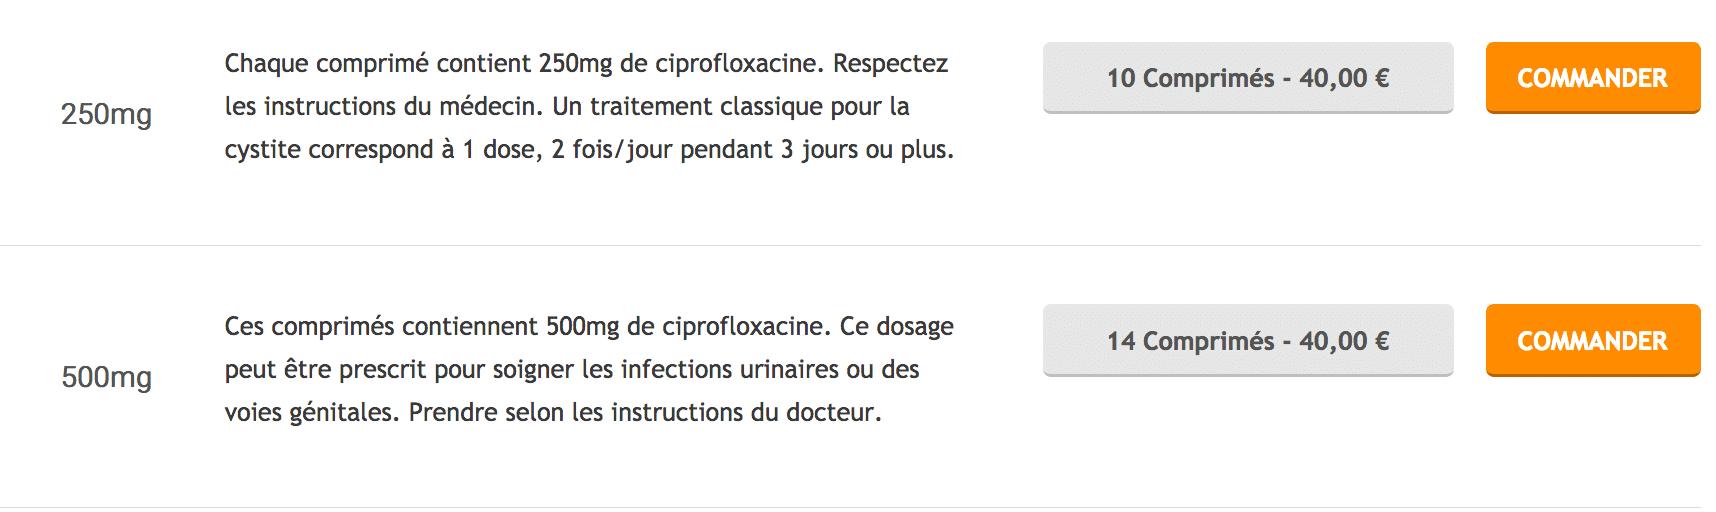 acheter ciprofloxacine